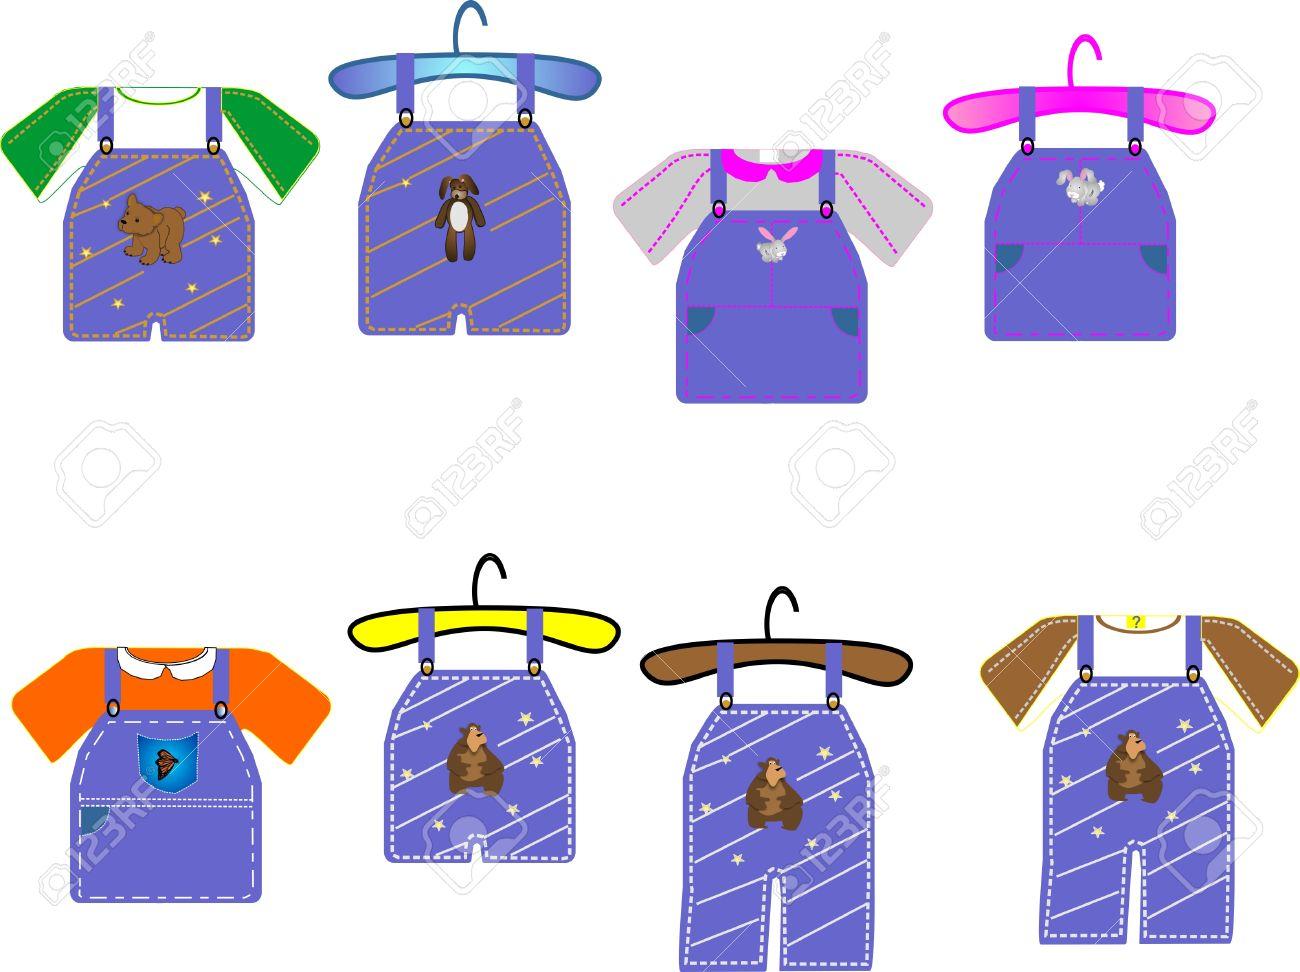 Kids shirt clipart 2 » Clipart Station.